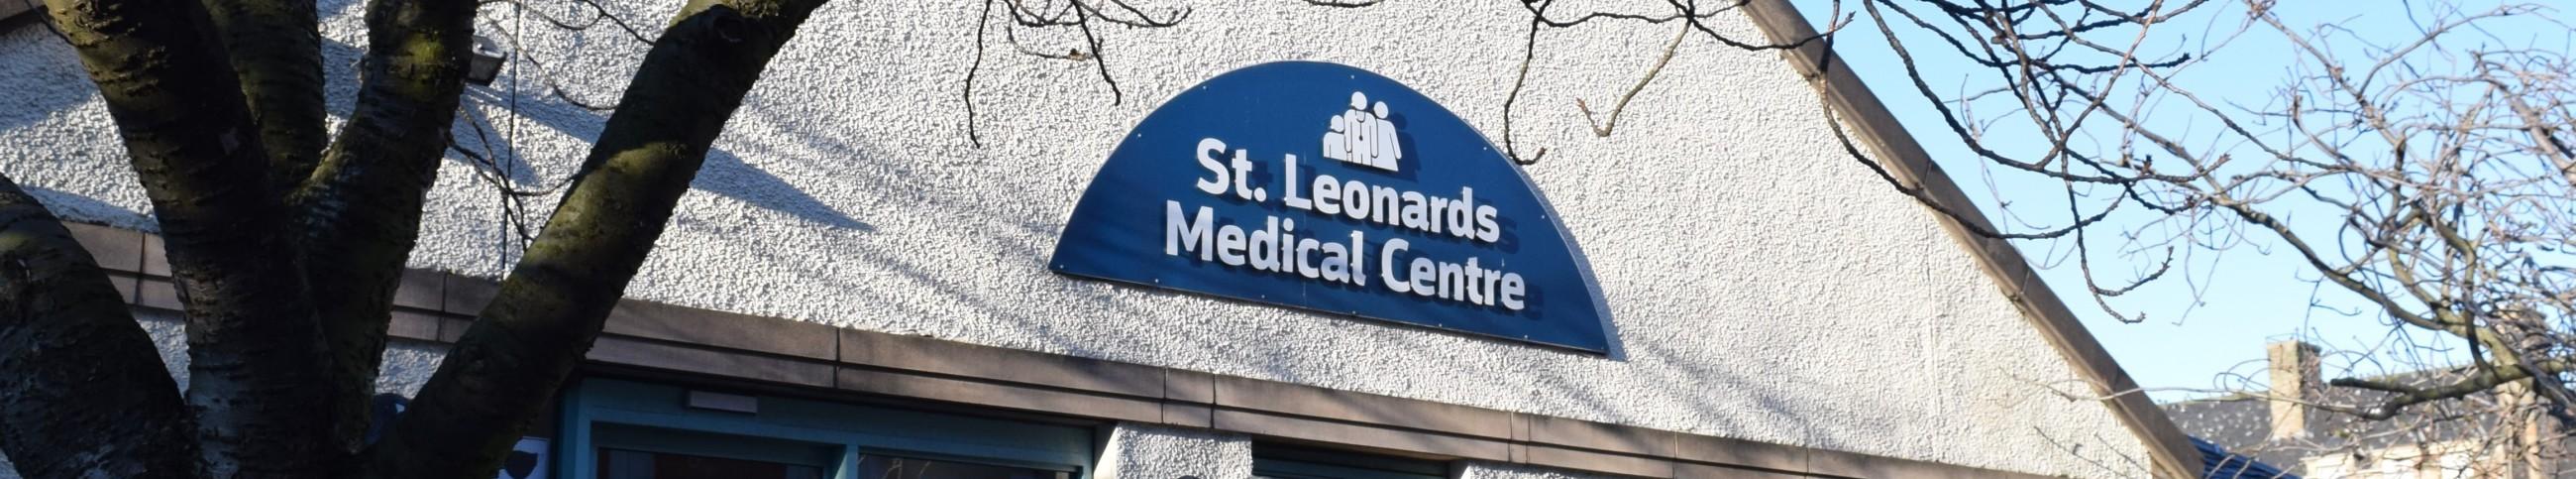 St. Leonards Medical Practice